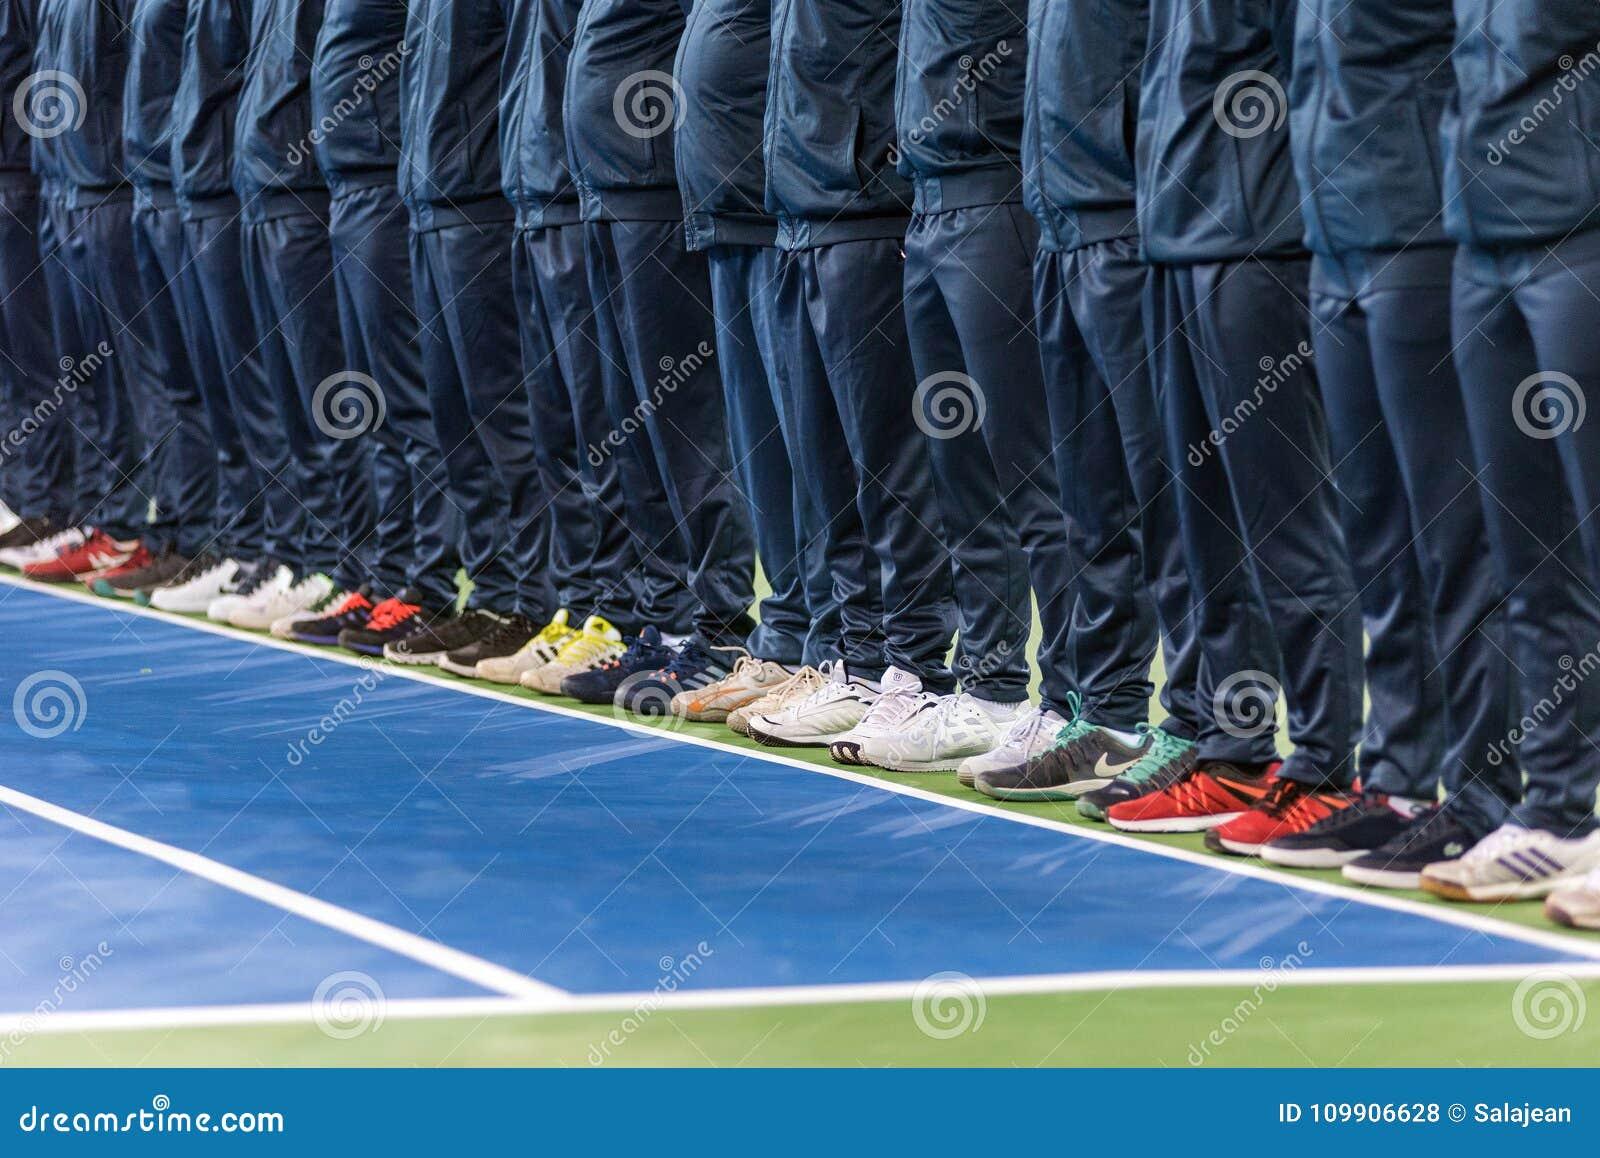 Line umpire. Tennis match opening ceremony